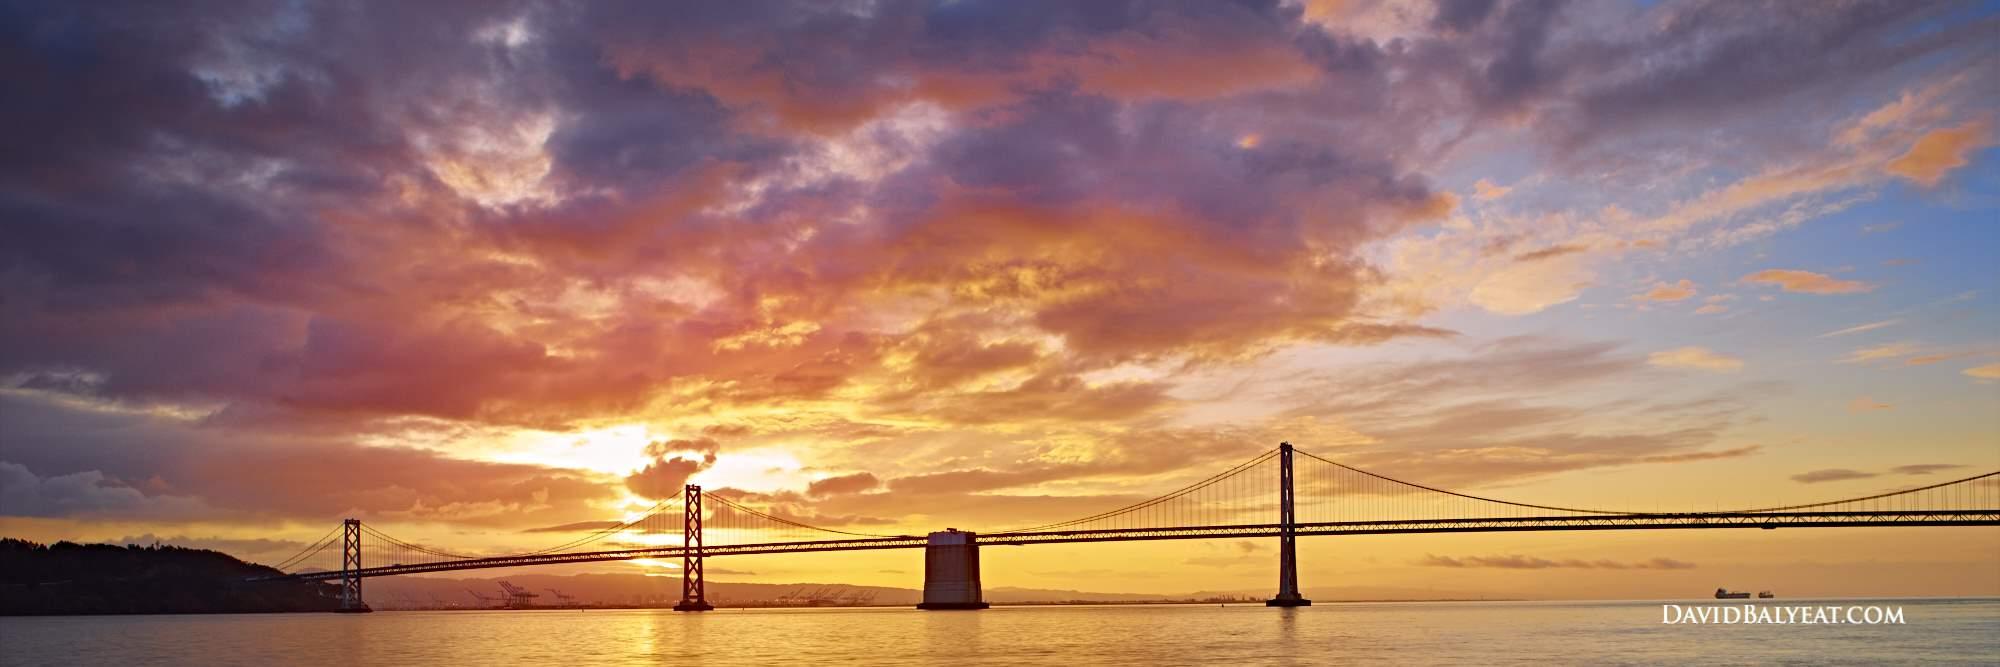 California archives david balyeat photography portfolio for San francisco landscape